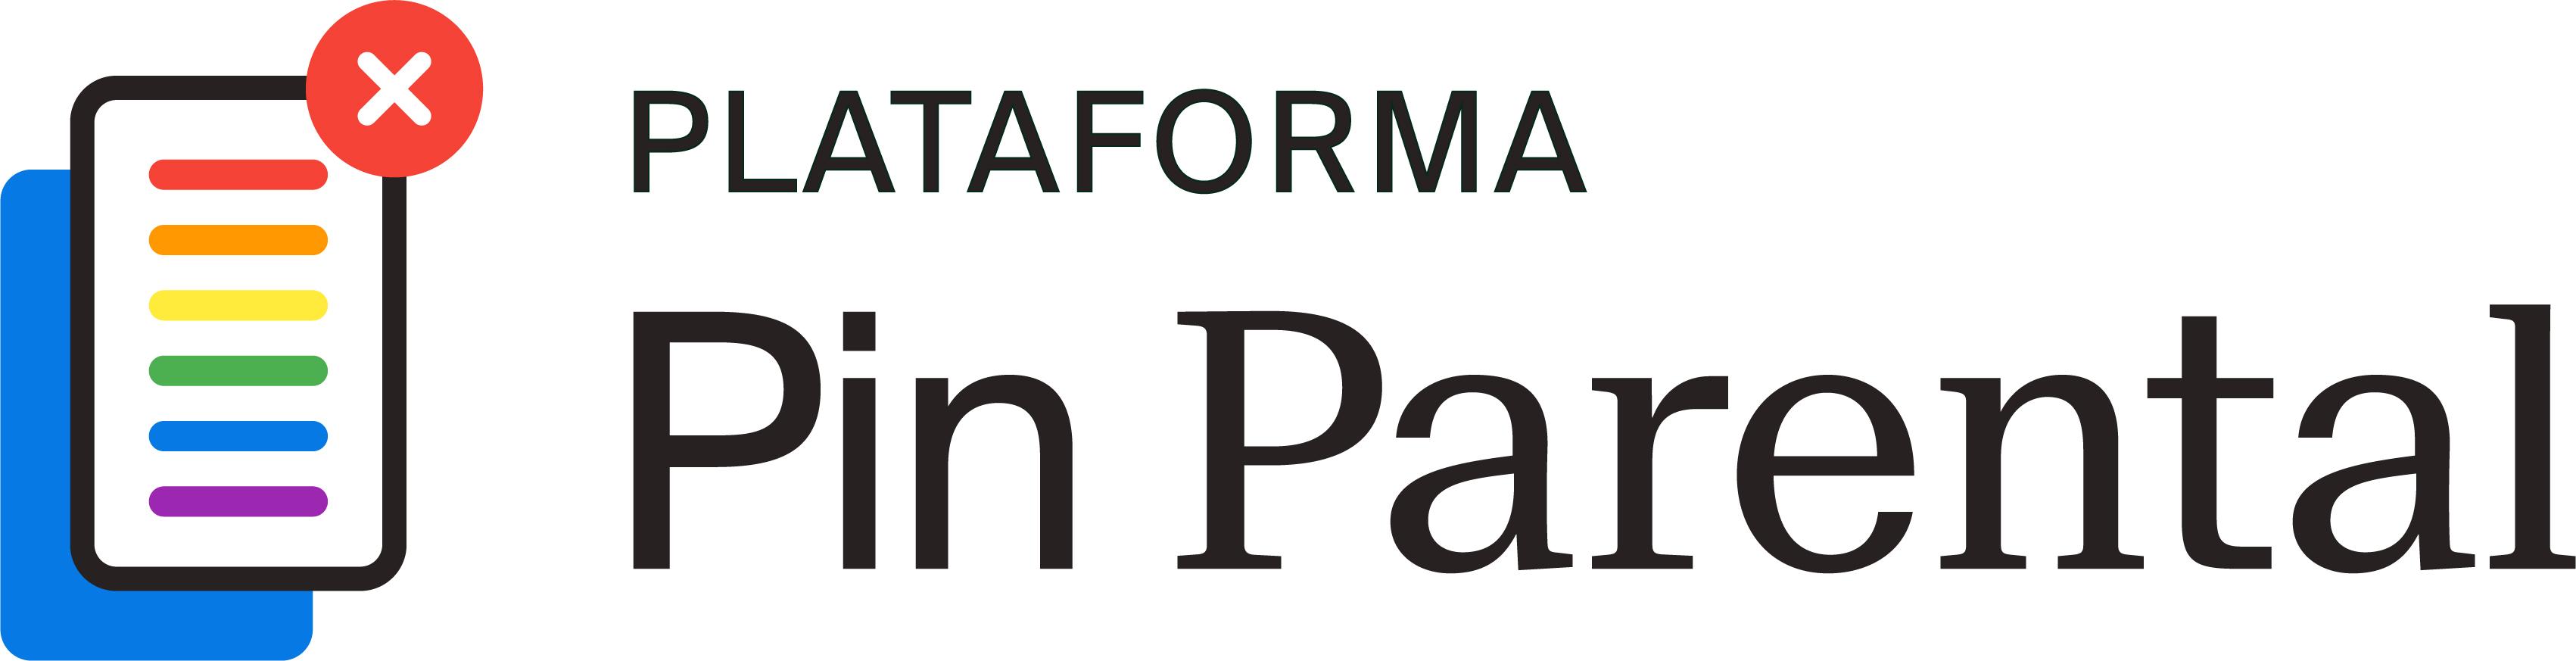 Plataformapinparental.org